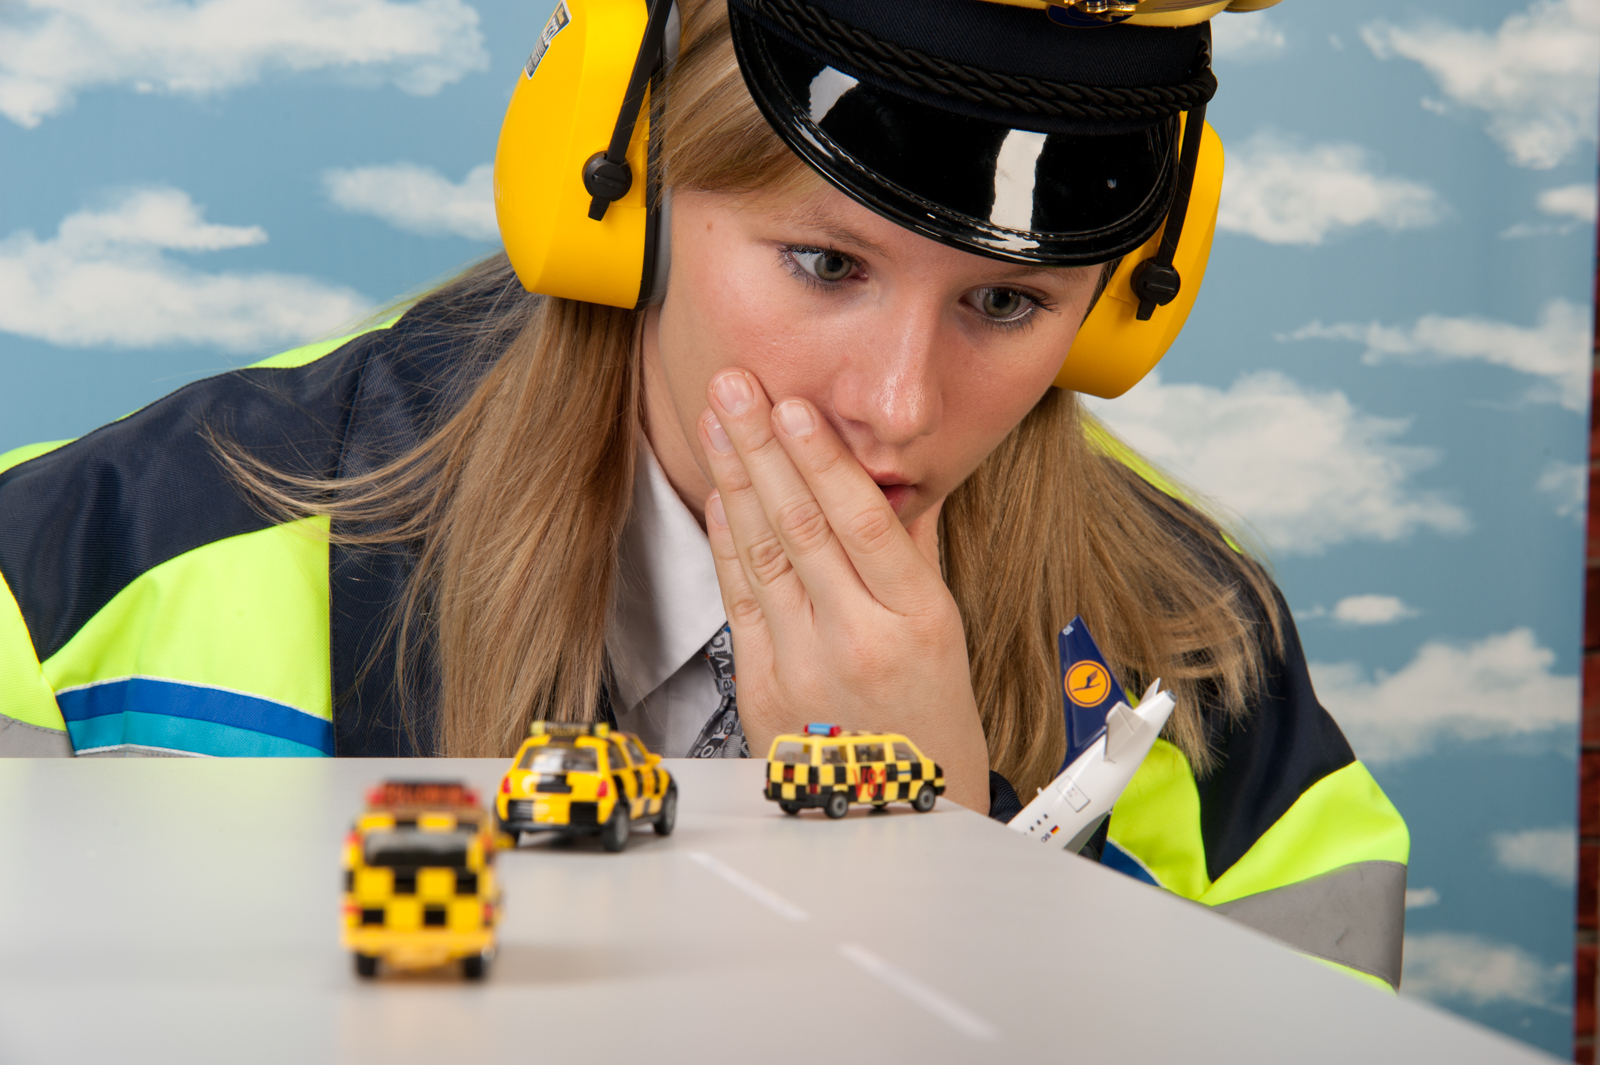 Flightcontrollergirl 5